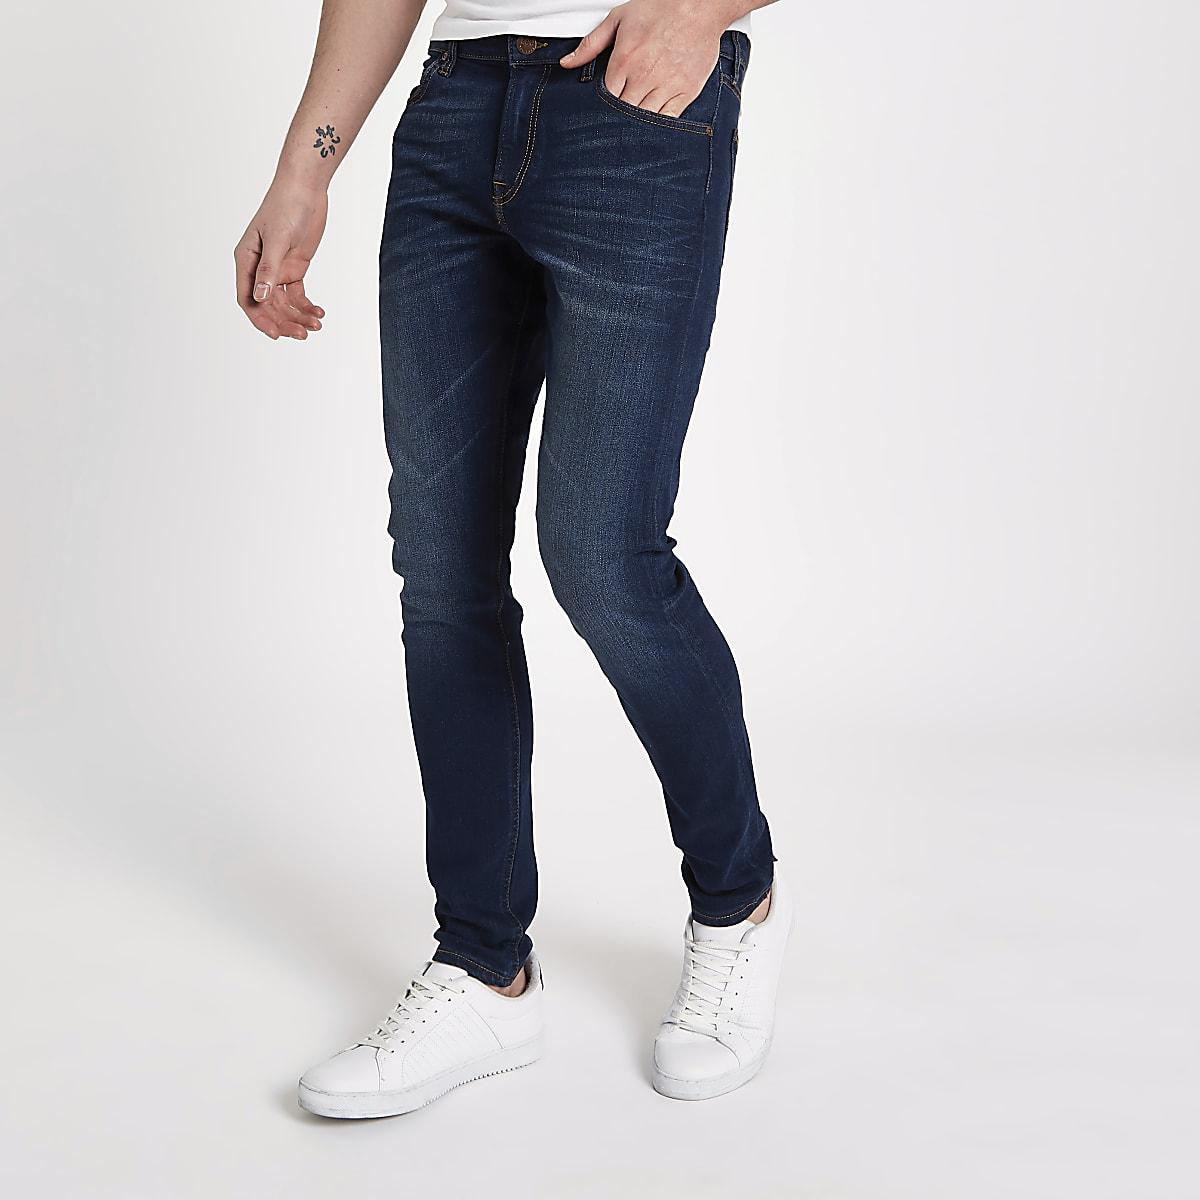 Lee blue stretch skinny fit Malone jeans